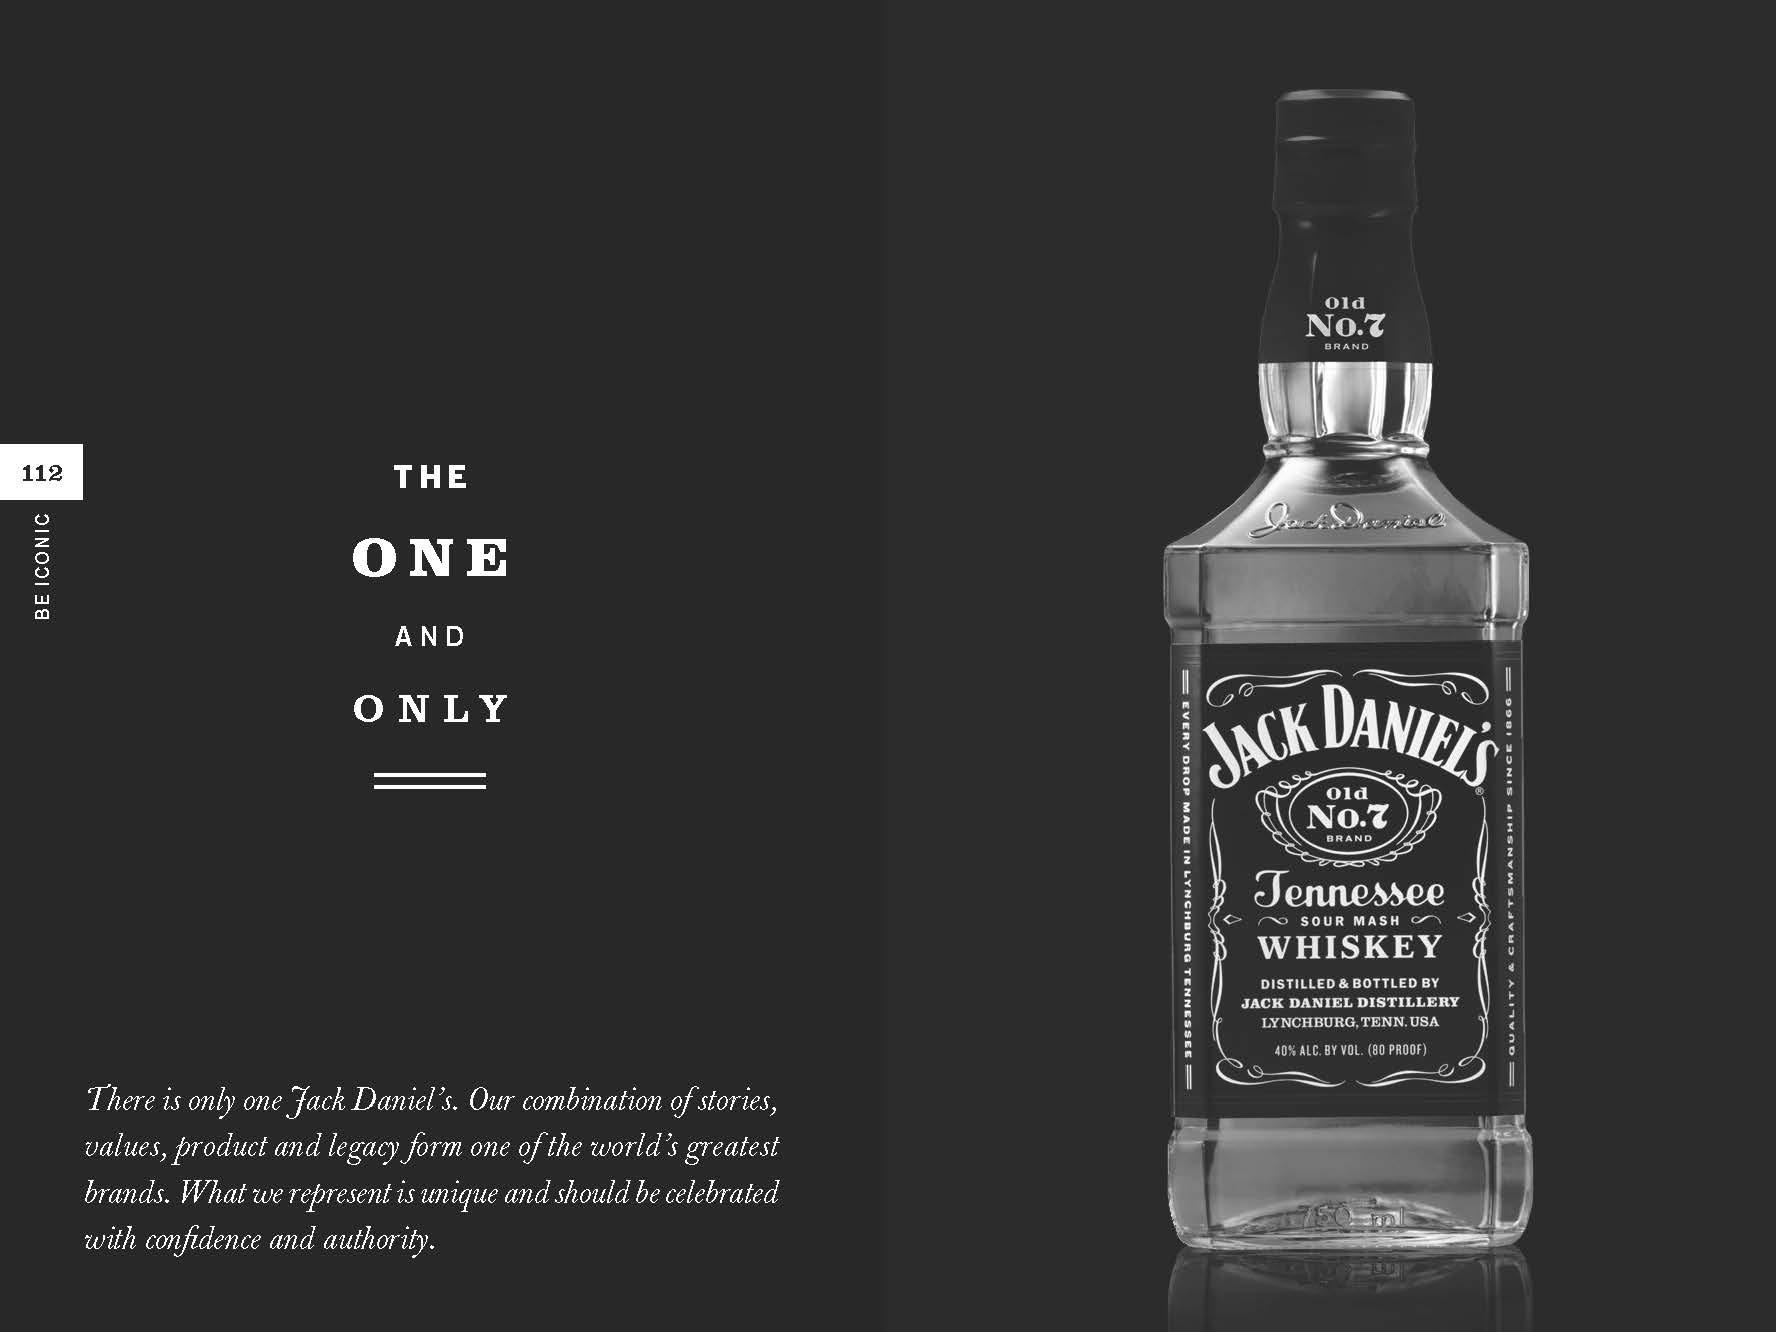 Jack Daniel's Guiding Principles 2012_Page_60.jpg